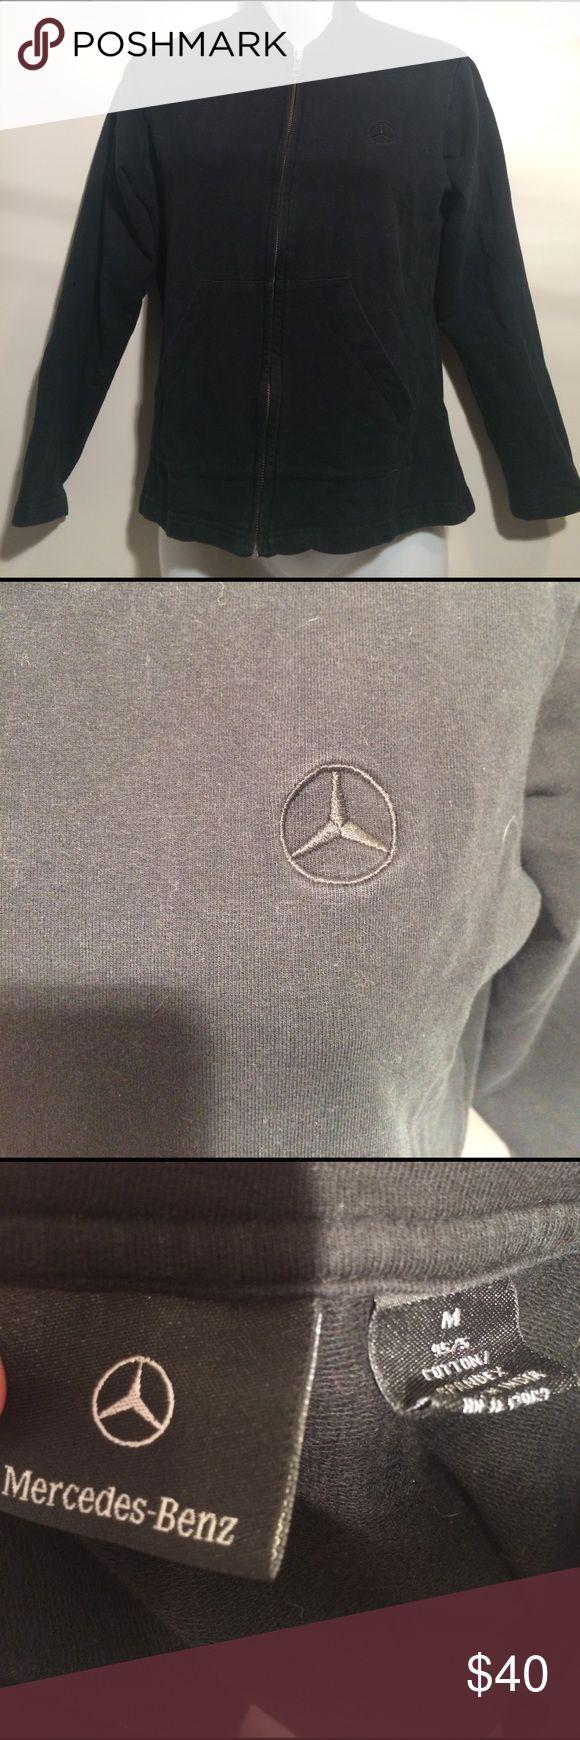 Mercedes-Benz Black Zip Up Sweater Mercedes-Benz black zip up sweater. Size medium. Good condition. No major signs of wear or staining Mercedes-Benz Tops Sweatshirts & Hoodies